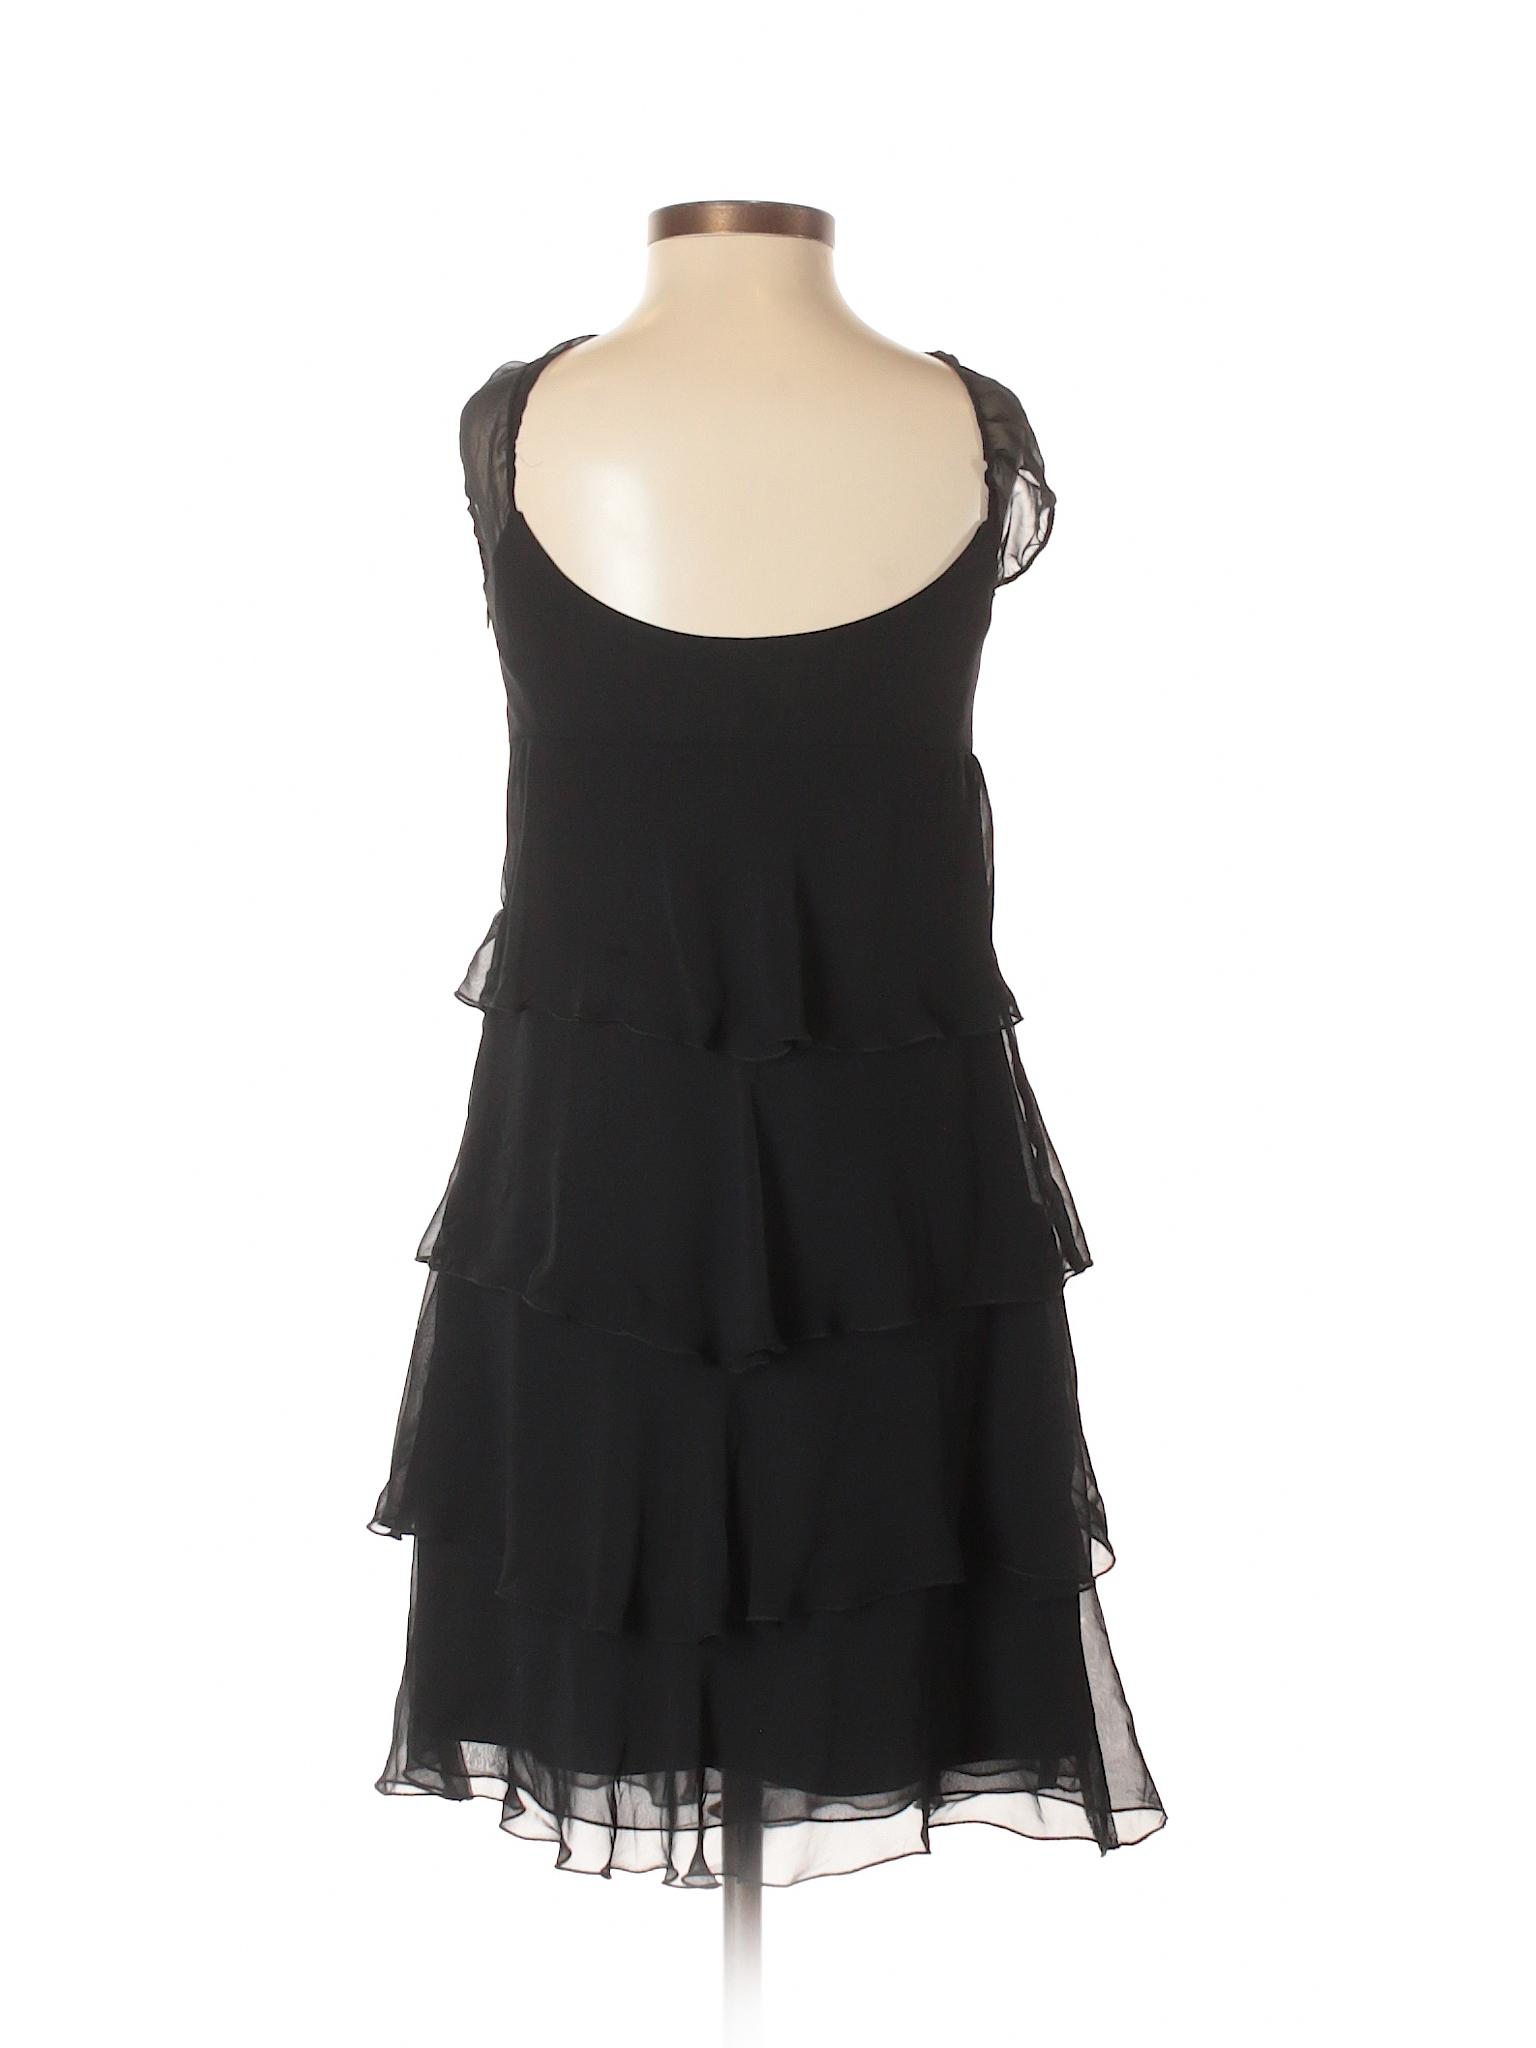 Dress winter Boutique ABS Allen Schwartz Casual wRwXqHx6